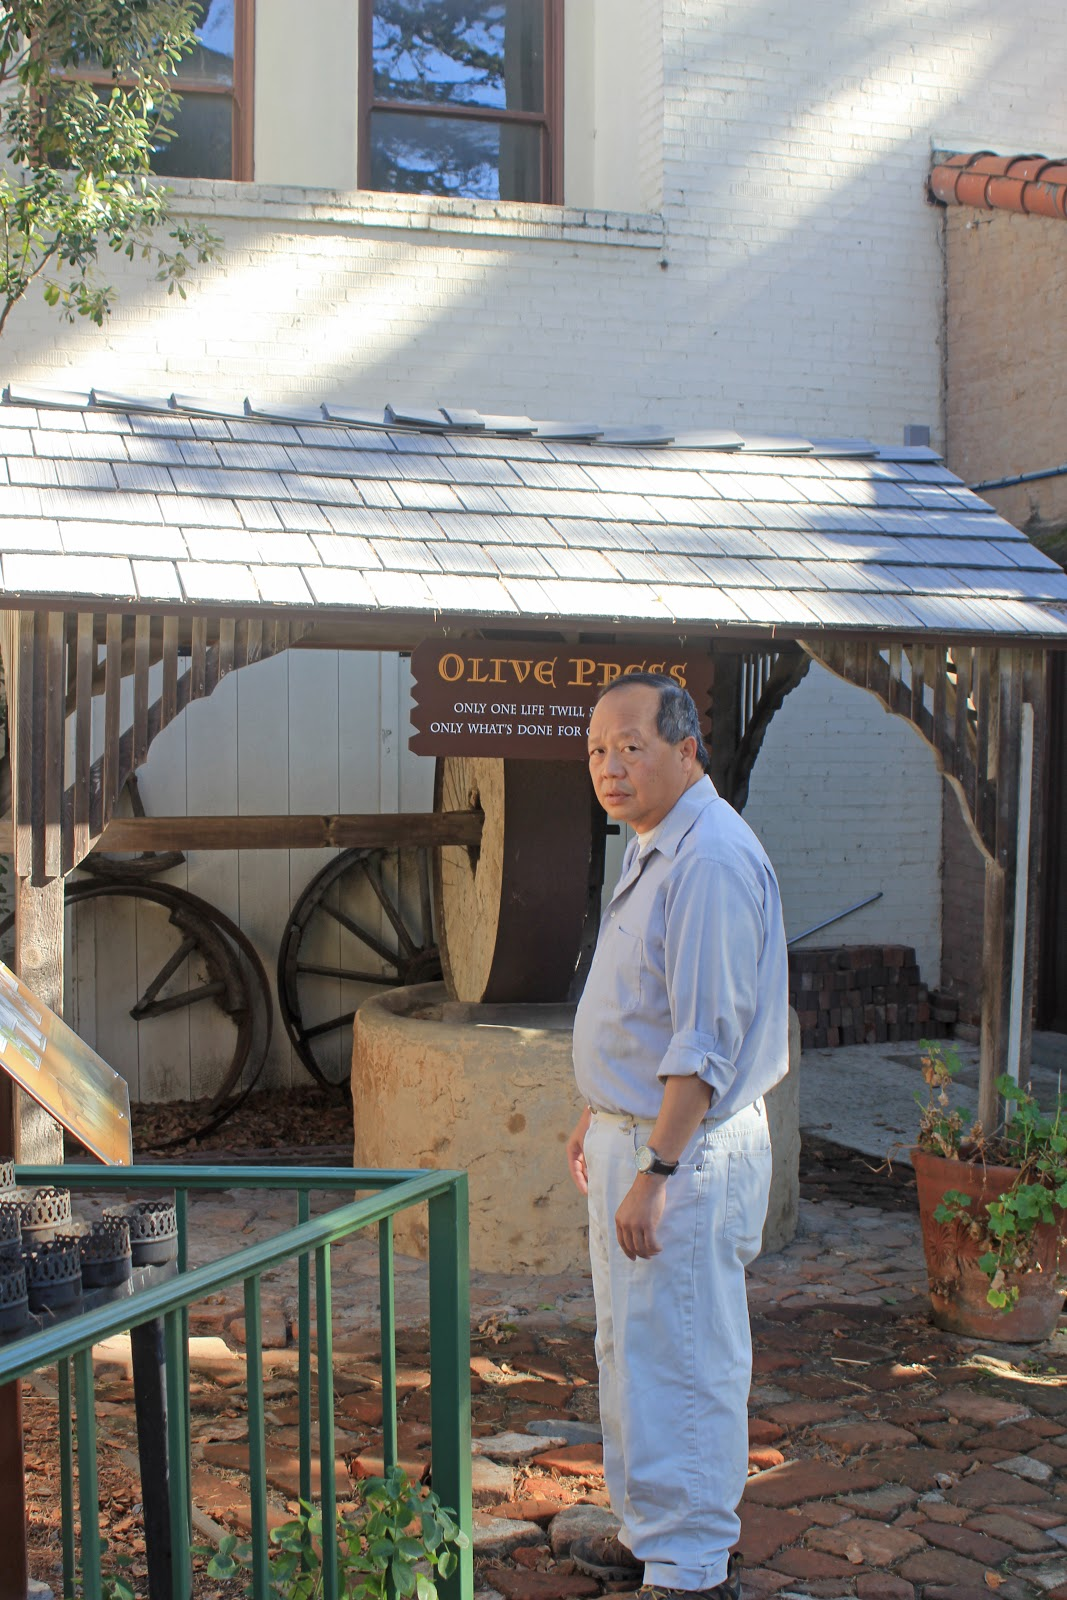 Western Sojourns Travels With Camissonia Mission San Buenaventura Ventura Ventura County Ca